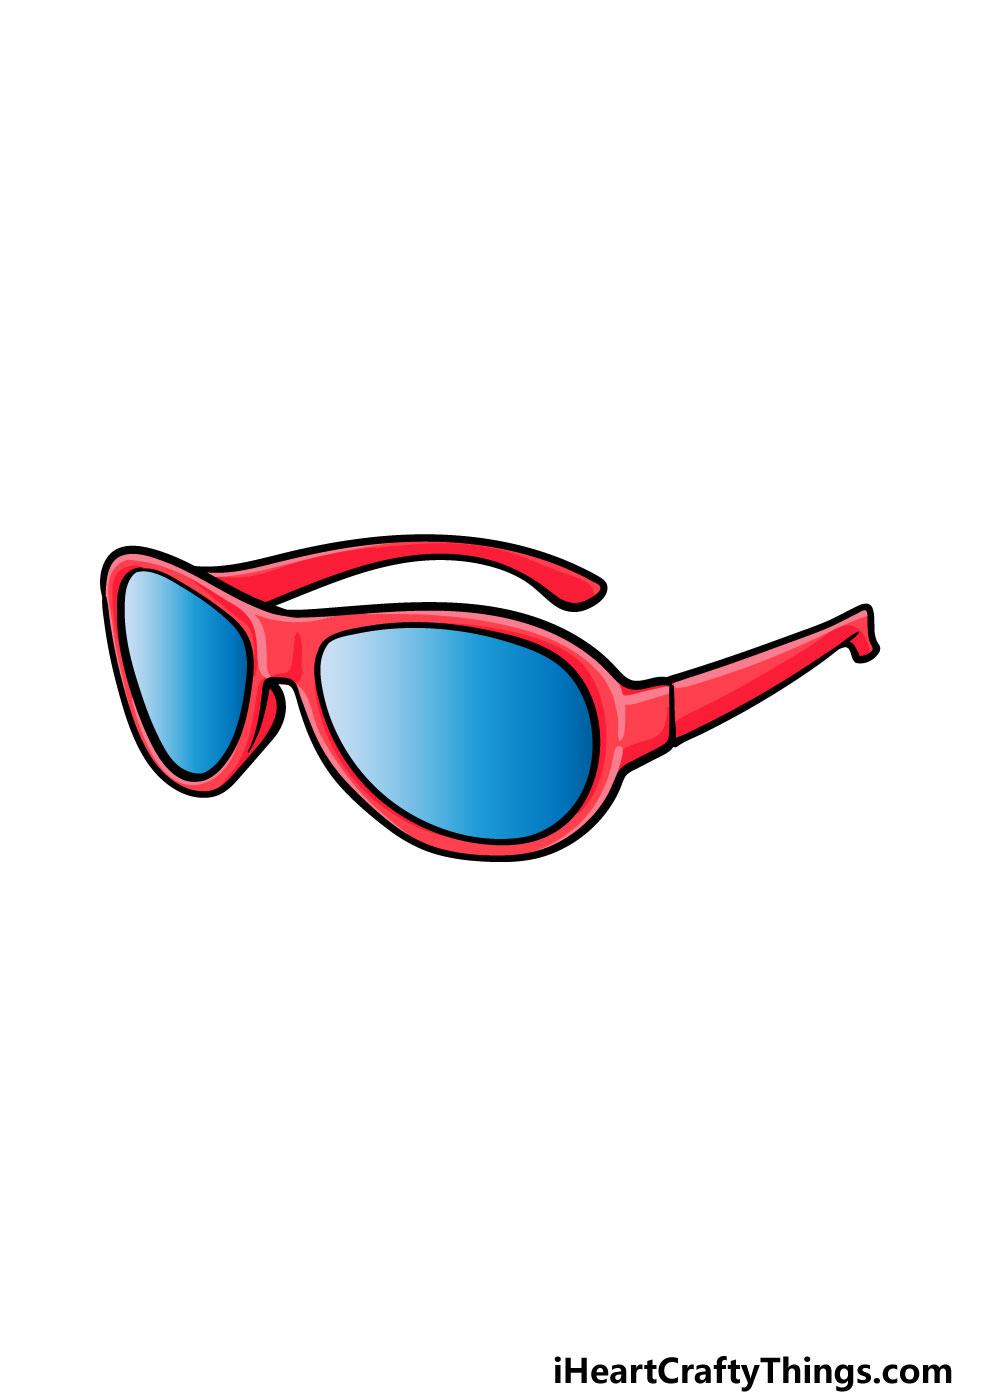 drawing sunglasses step 6